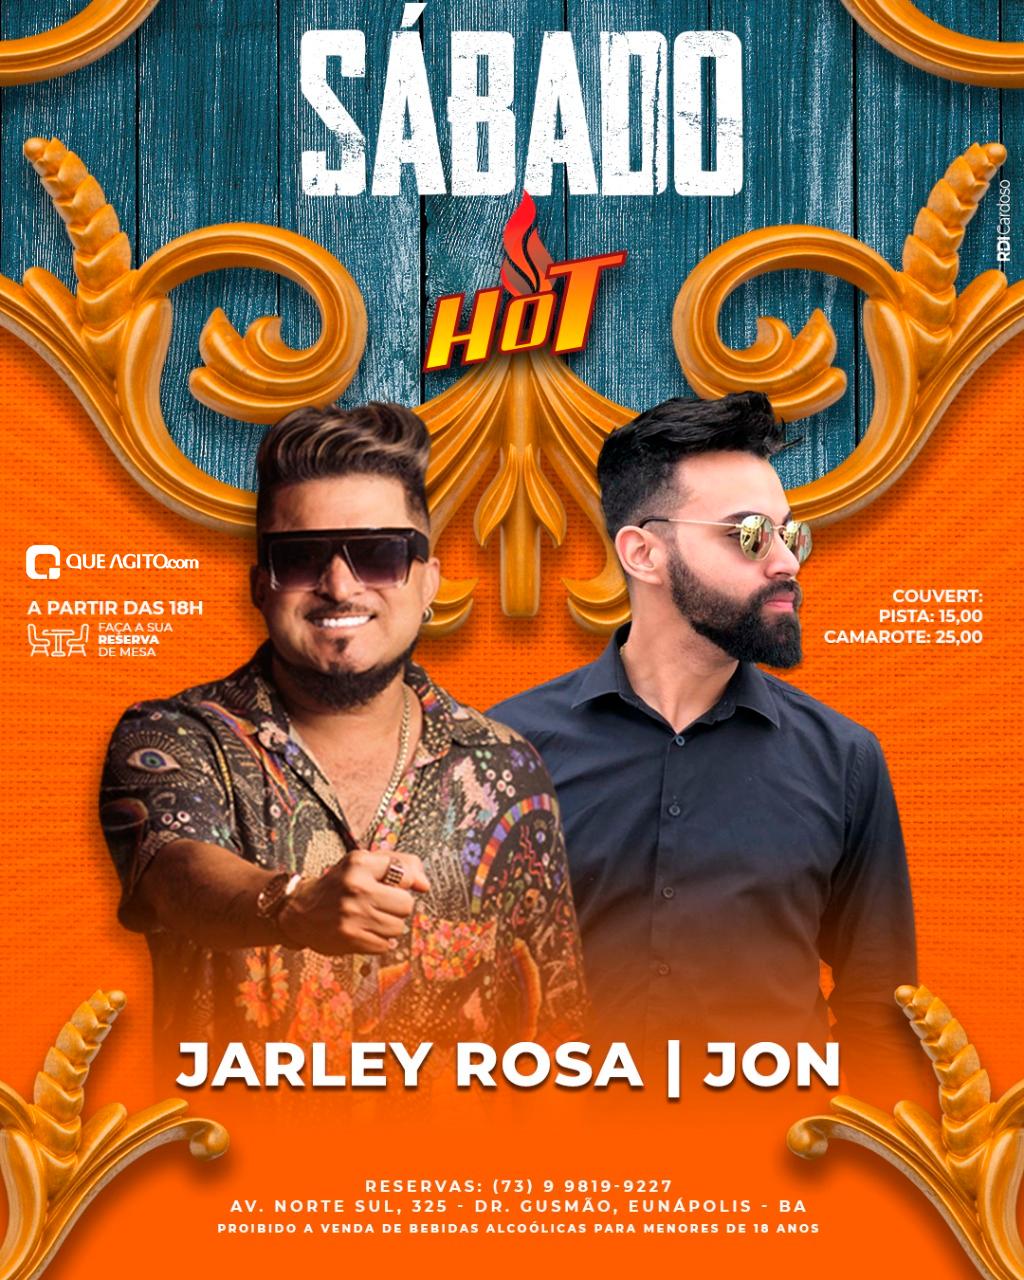 Sábado na Hot com Jarley Rosa e Jon - Eunápolis-BA 16